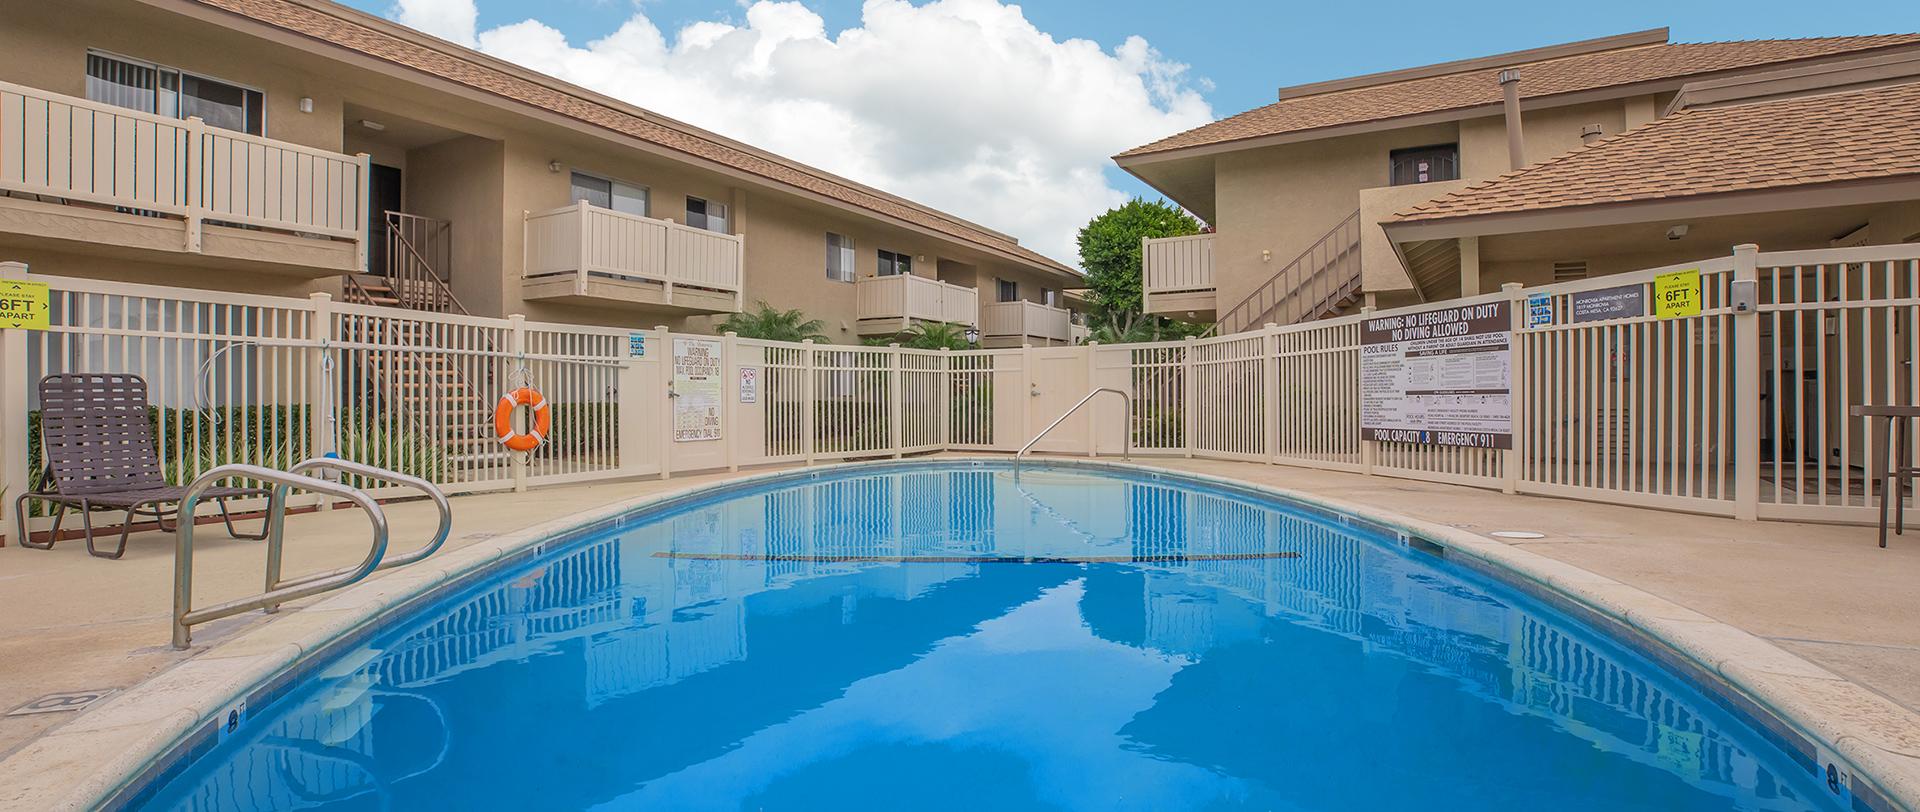 The Monrovia Apartment Homes Apartments In Costa Mesa Ca